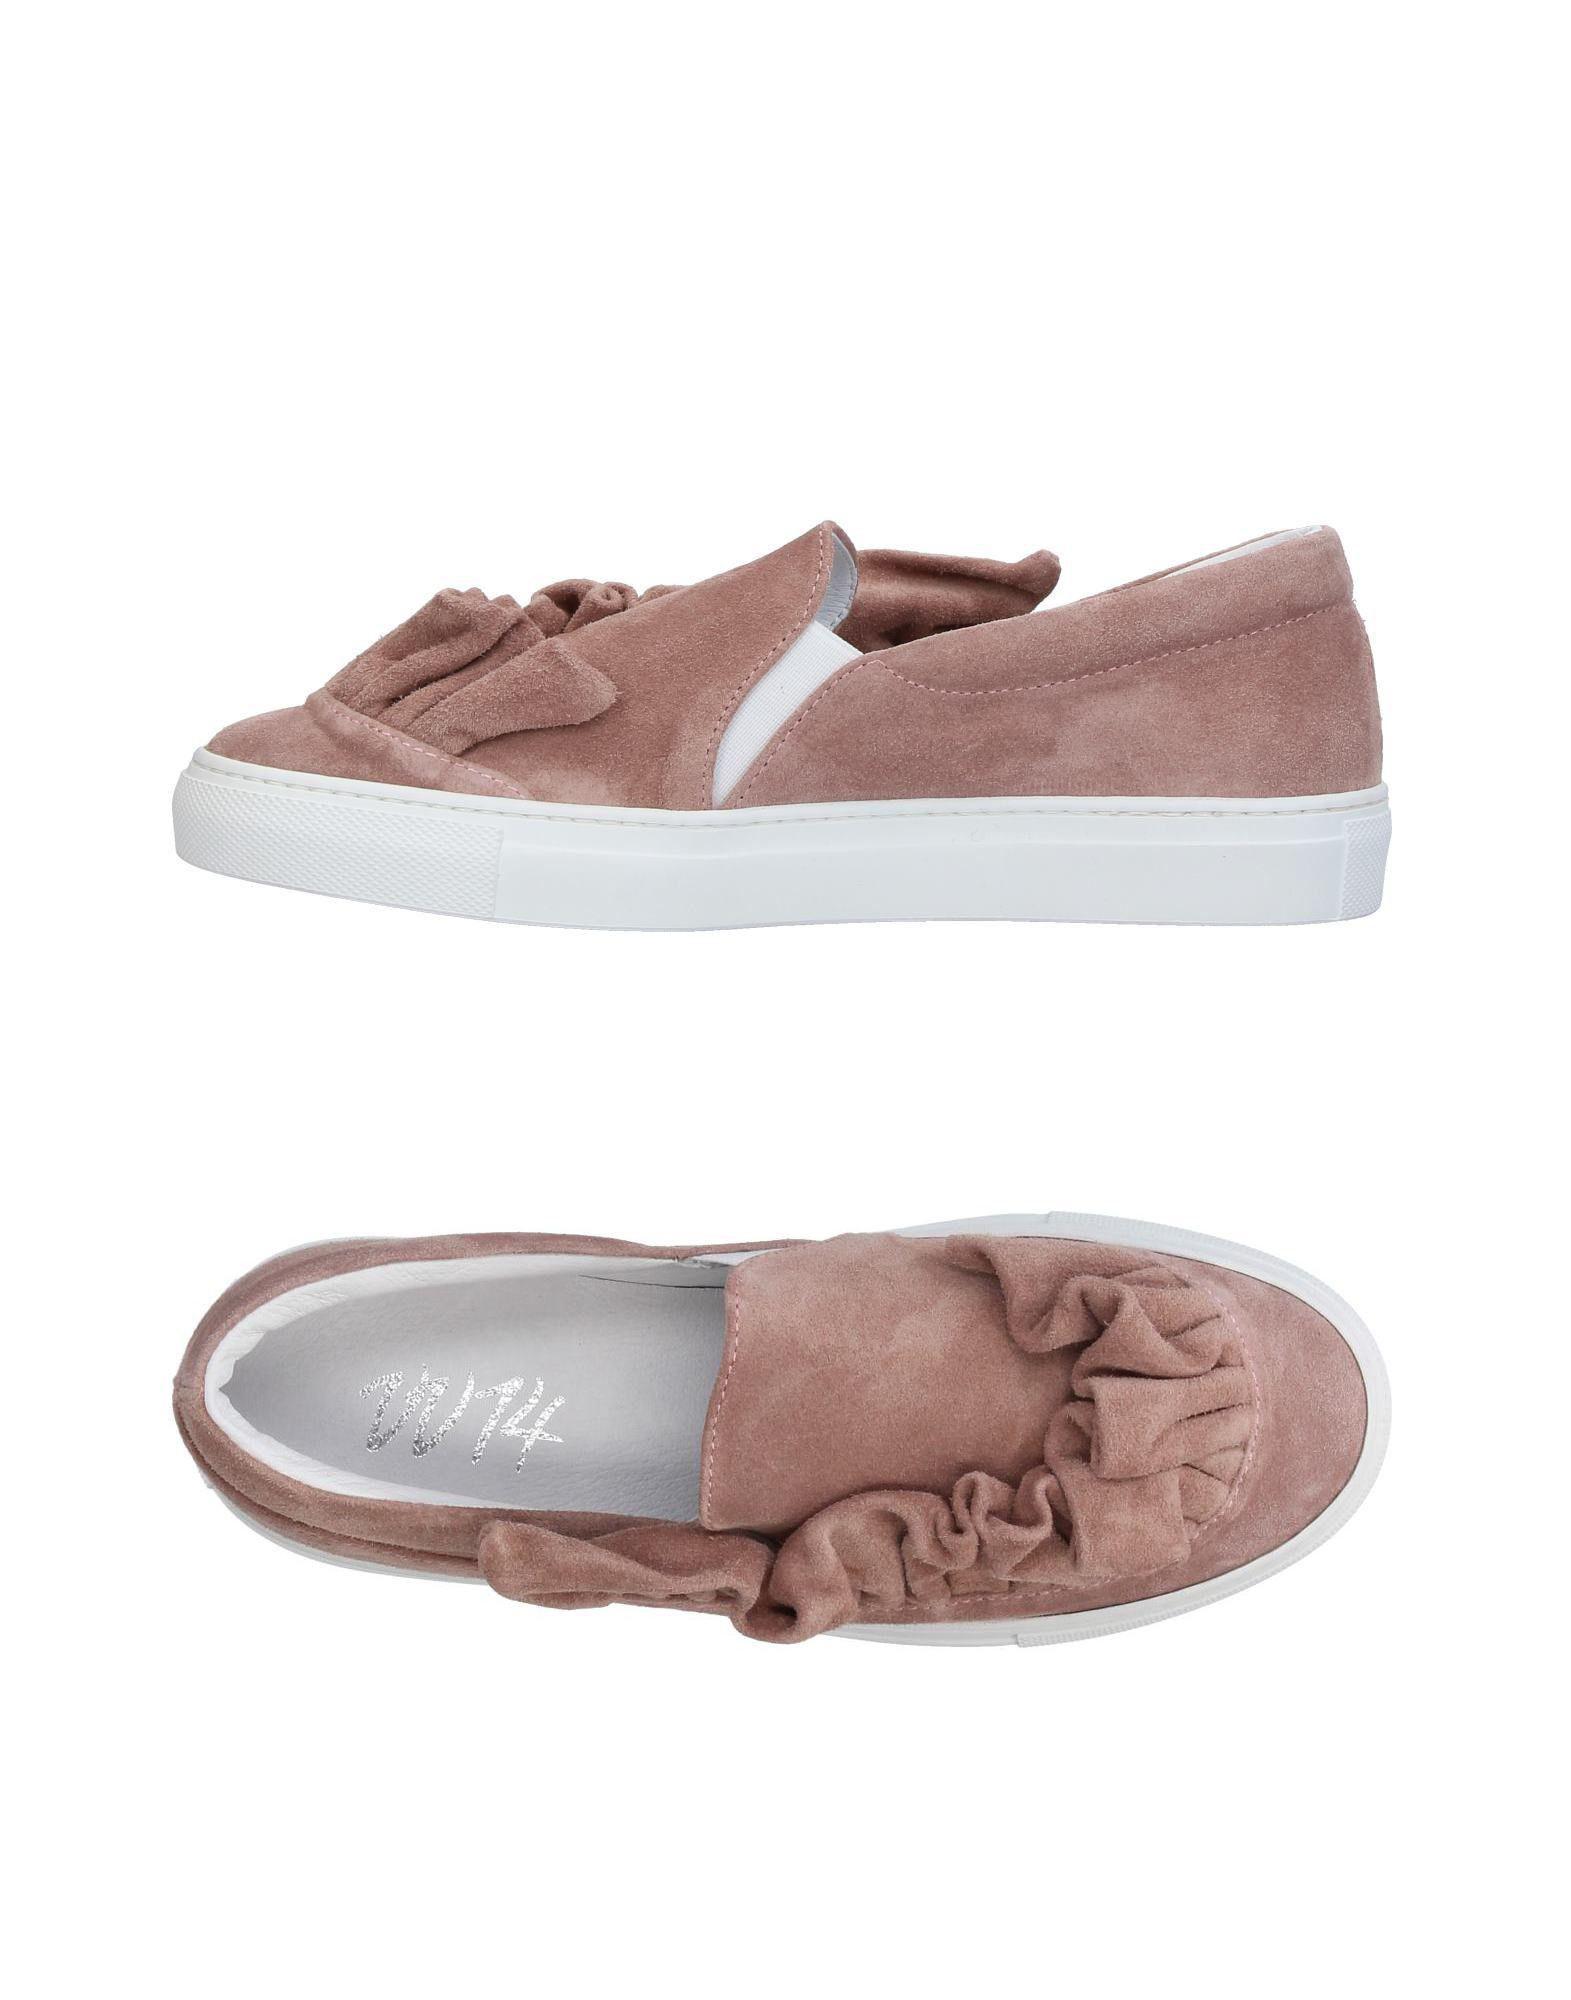 online store 20859 a61dd via-vela-14-Light-brown-Low-tops-Sneakers.jpeg